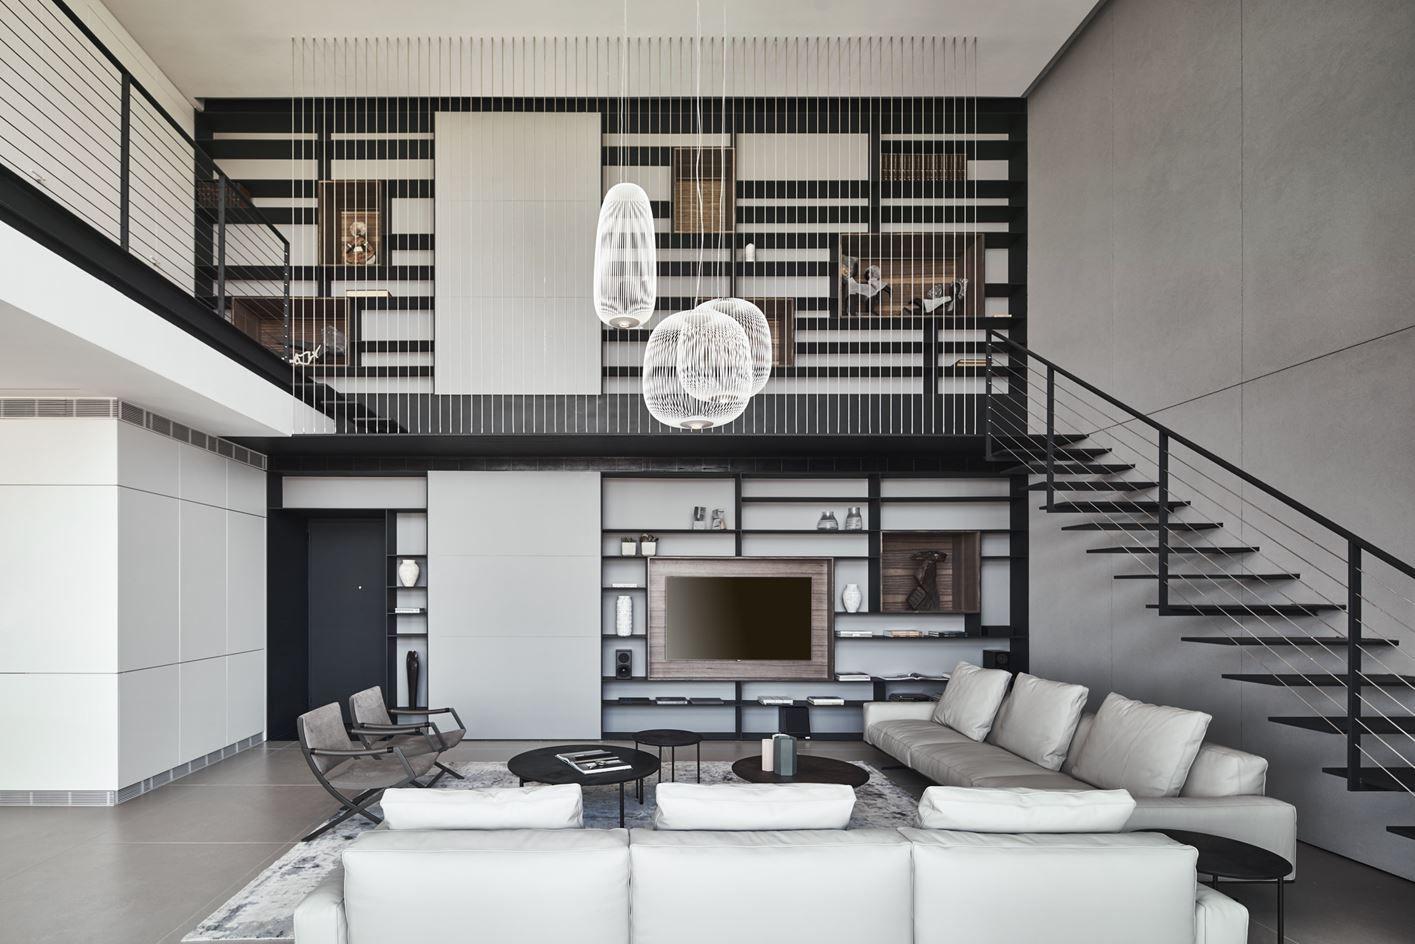 A Duplex Apartment - Picture gallery | Duplex apartment